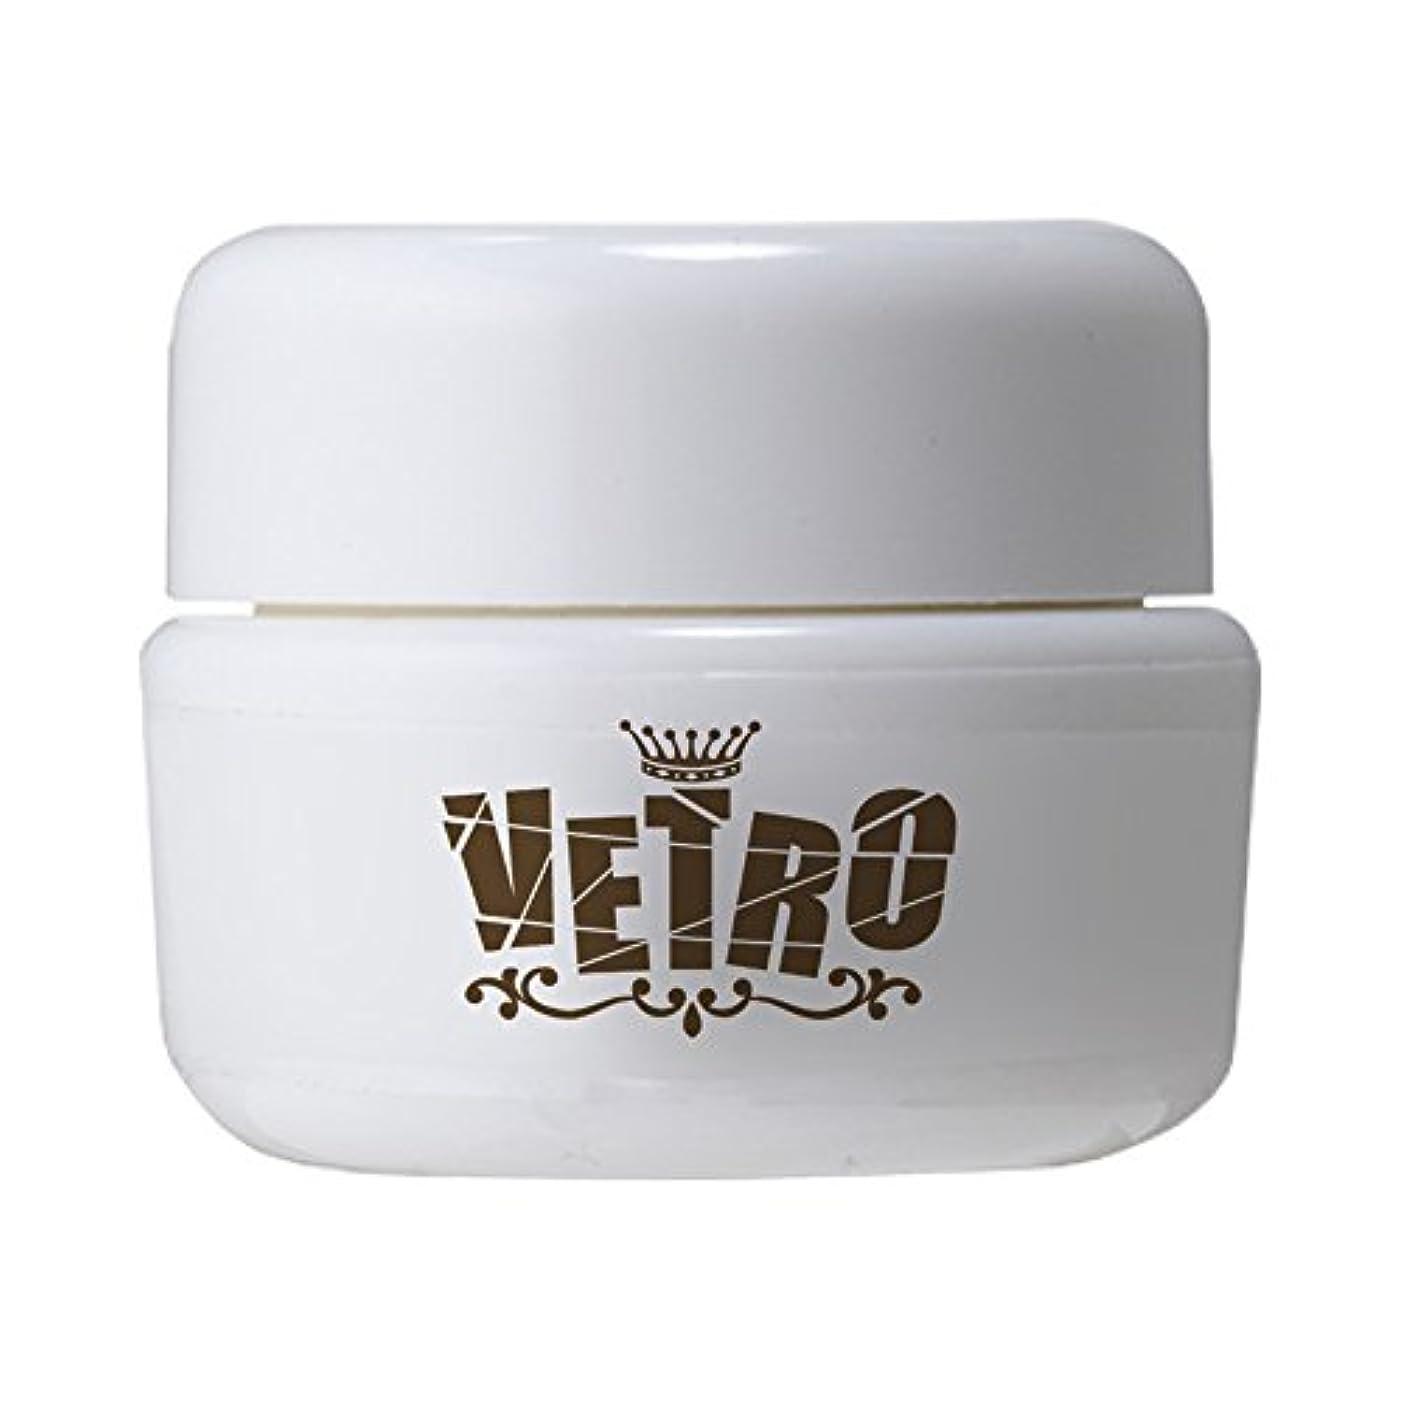 VETRO カラージェル VL355 クラッカーナイト 4ml UV/LED対応 ソークオフジェル ブラックグリッター